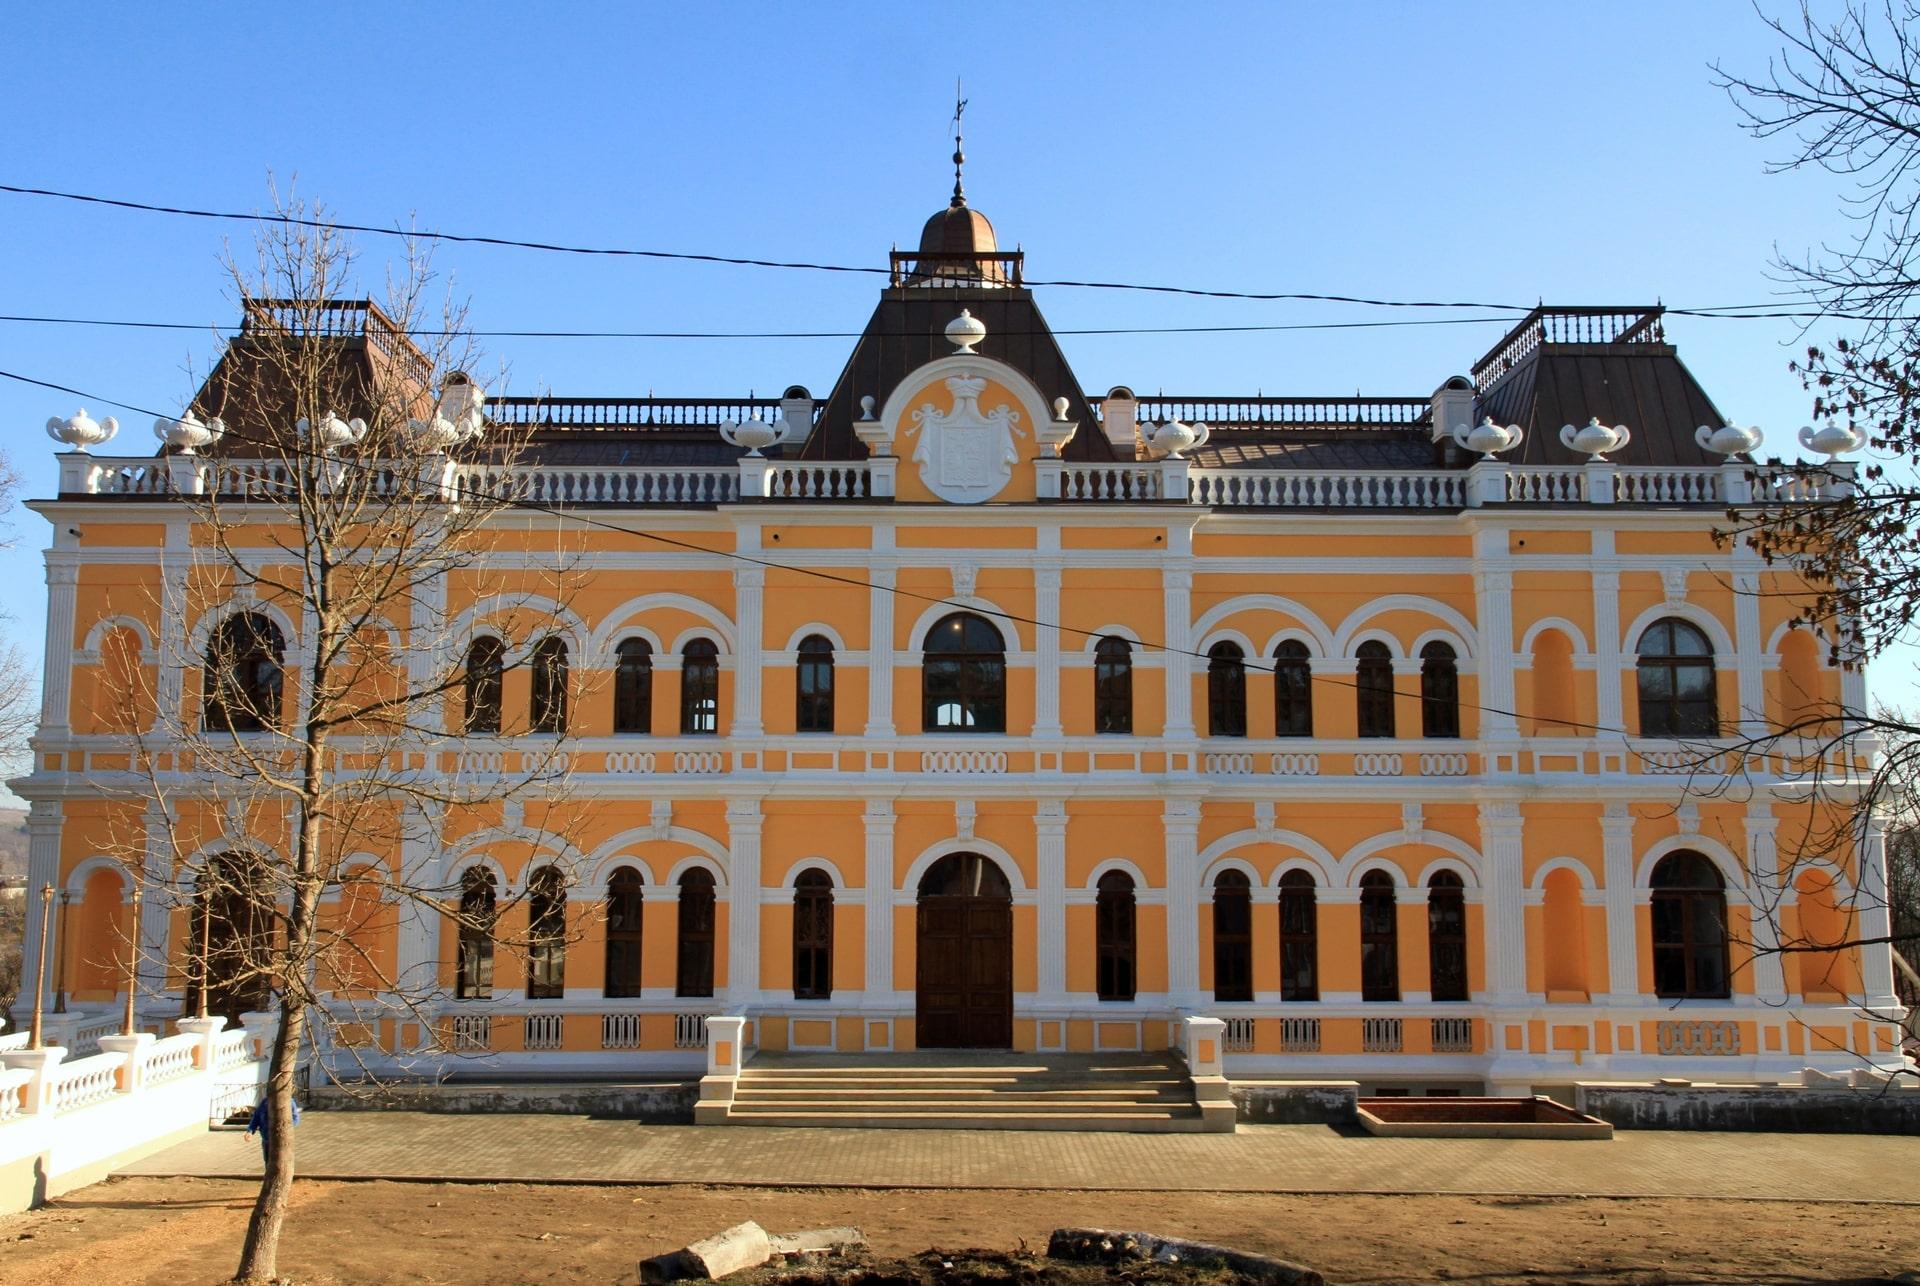 Manuc Bey Sarayı